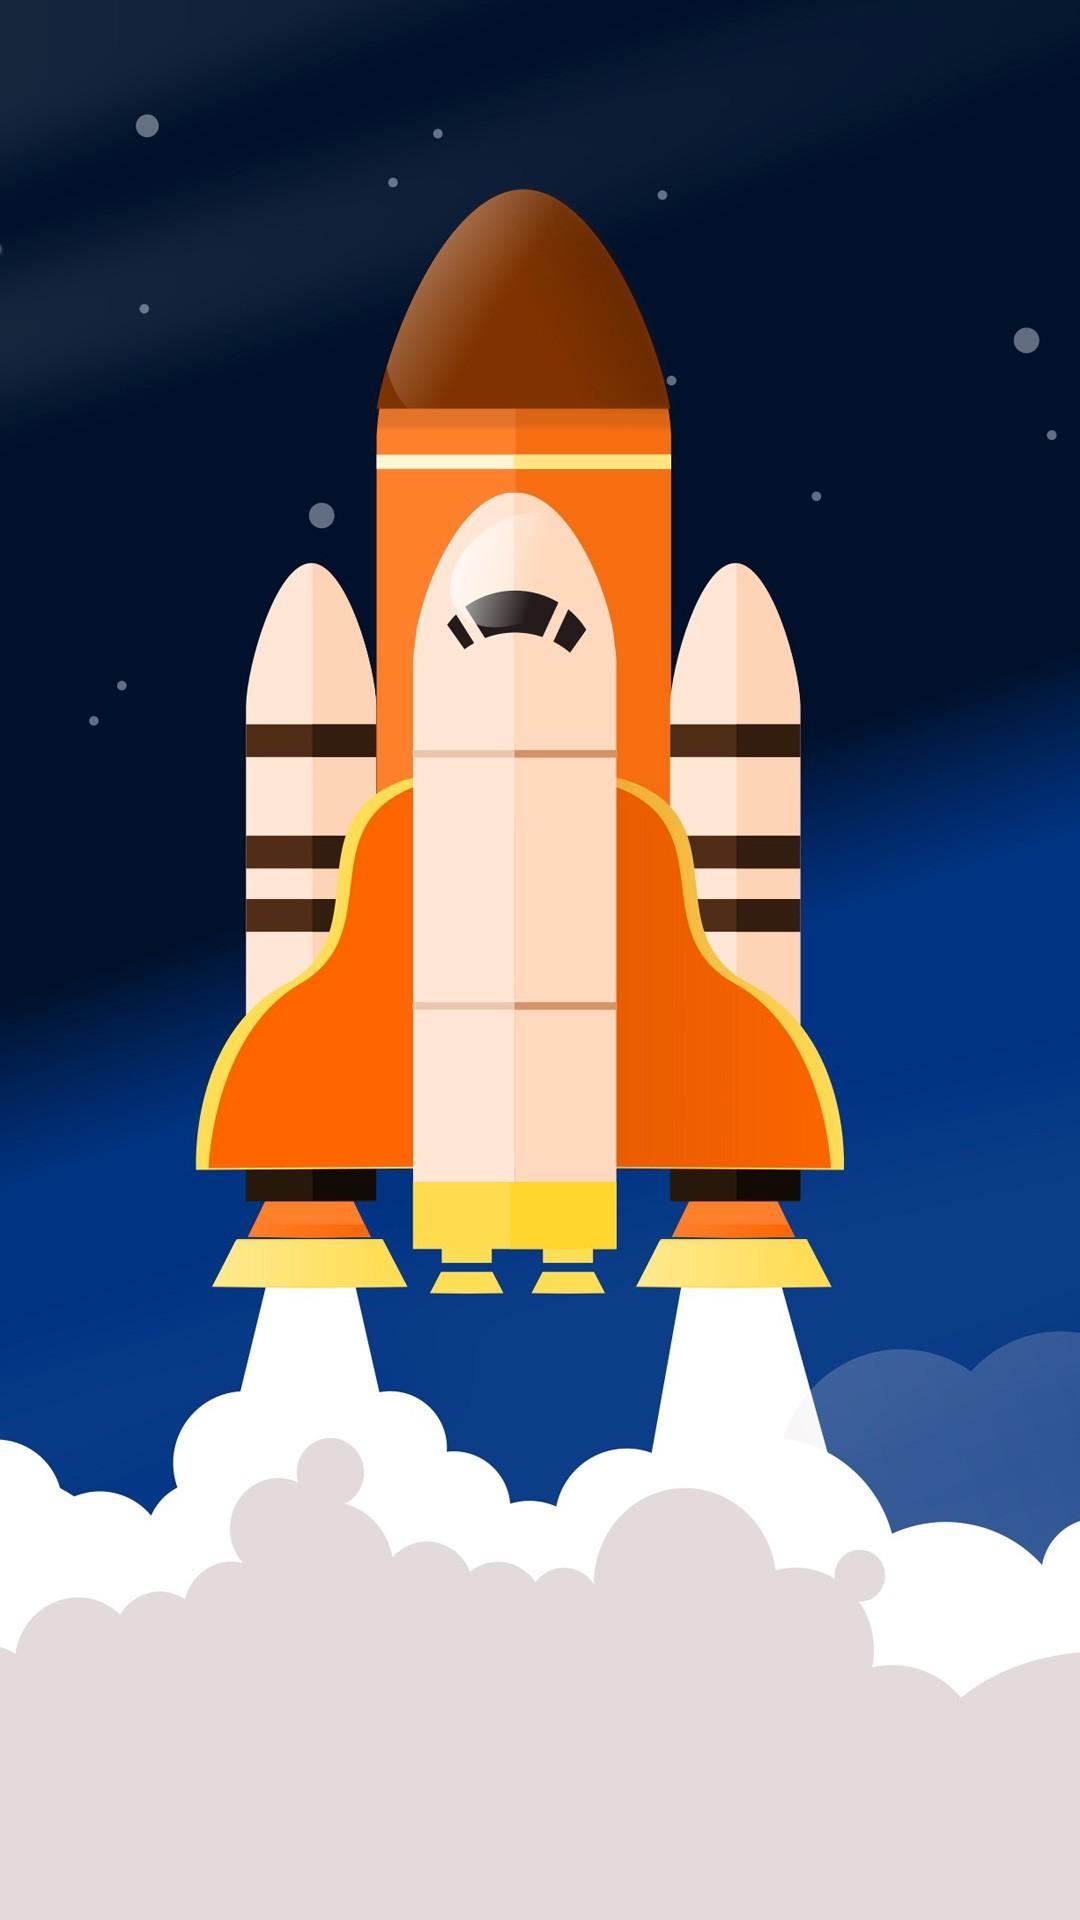 Batman Animated Wallpaper Space Shuttle Rocket Wallpapers Hd Wallpapers Id 19013